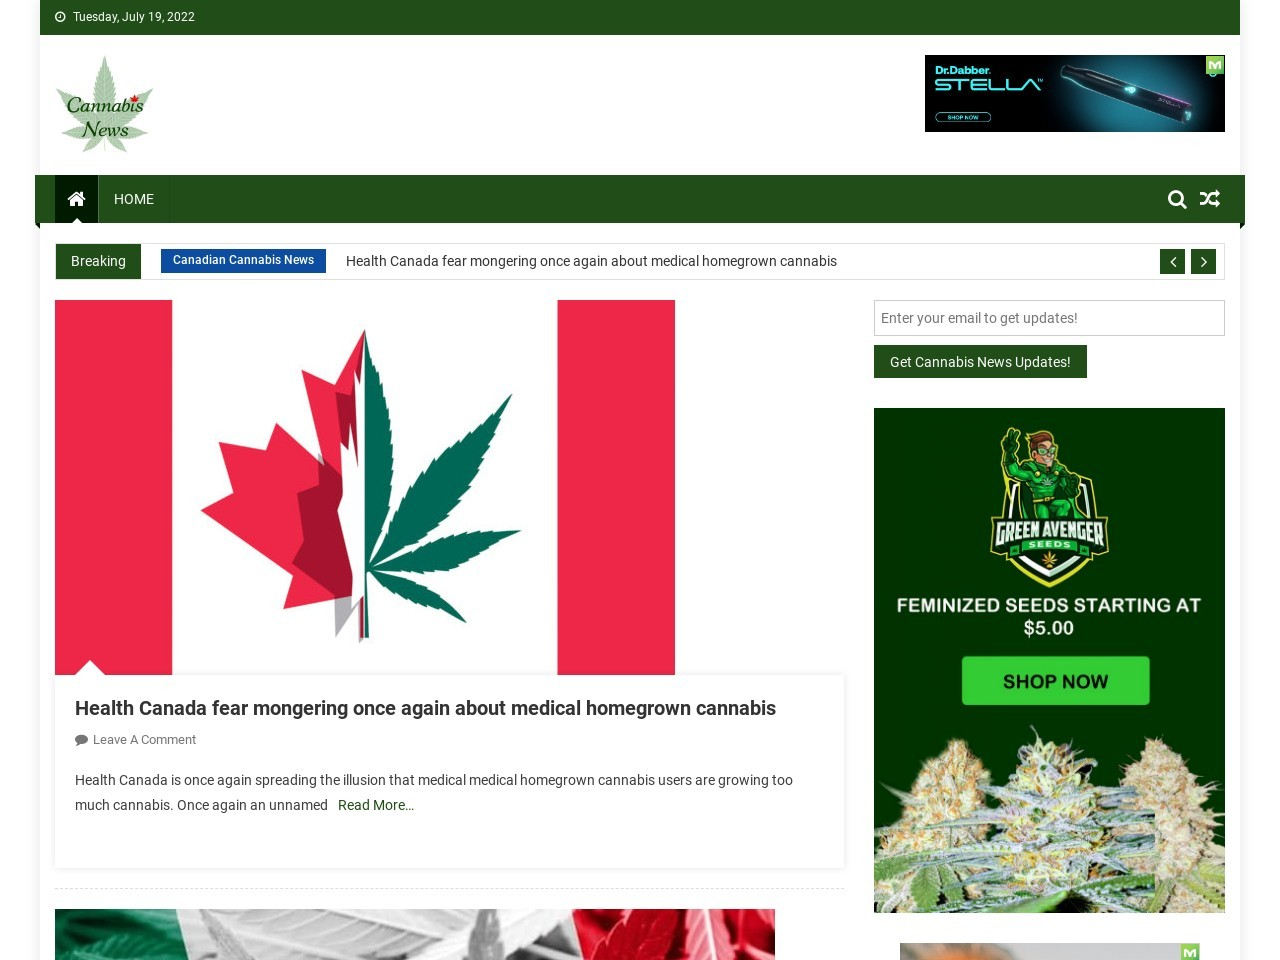 Proposals Would Legalize Marijuana in Ohio